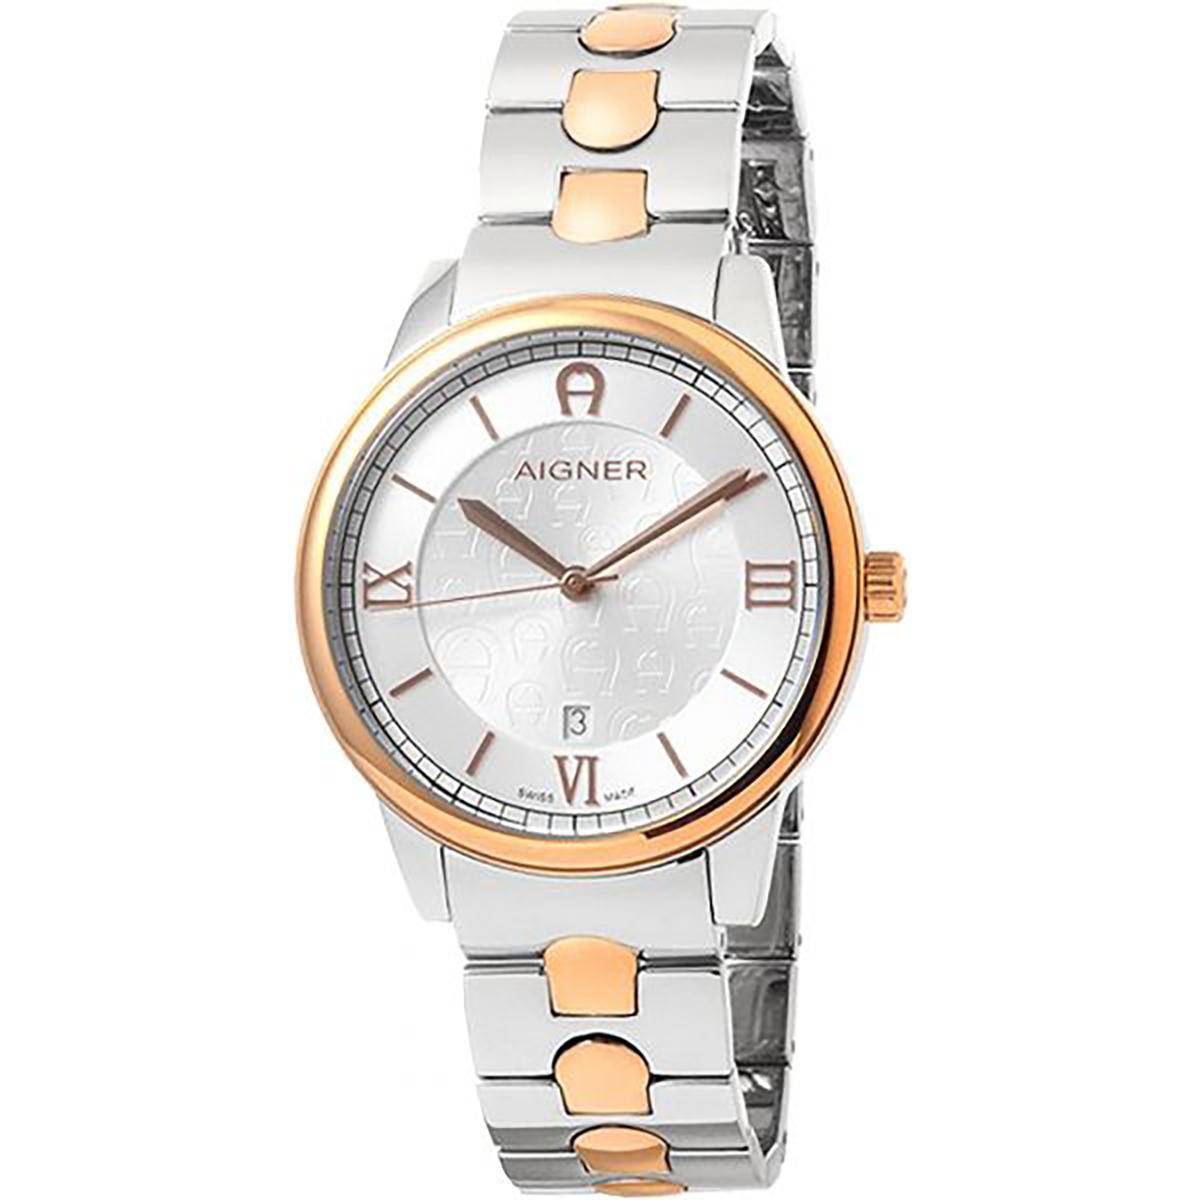 ساعت مچی عقربه ای مردانه اگنر مدل A24050 30